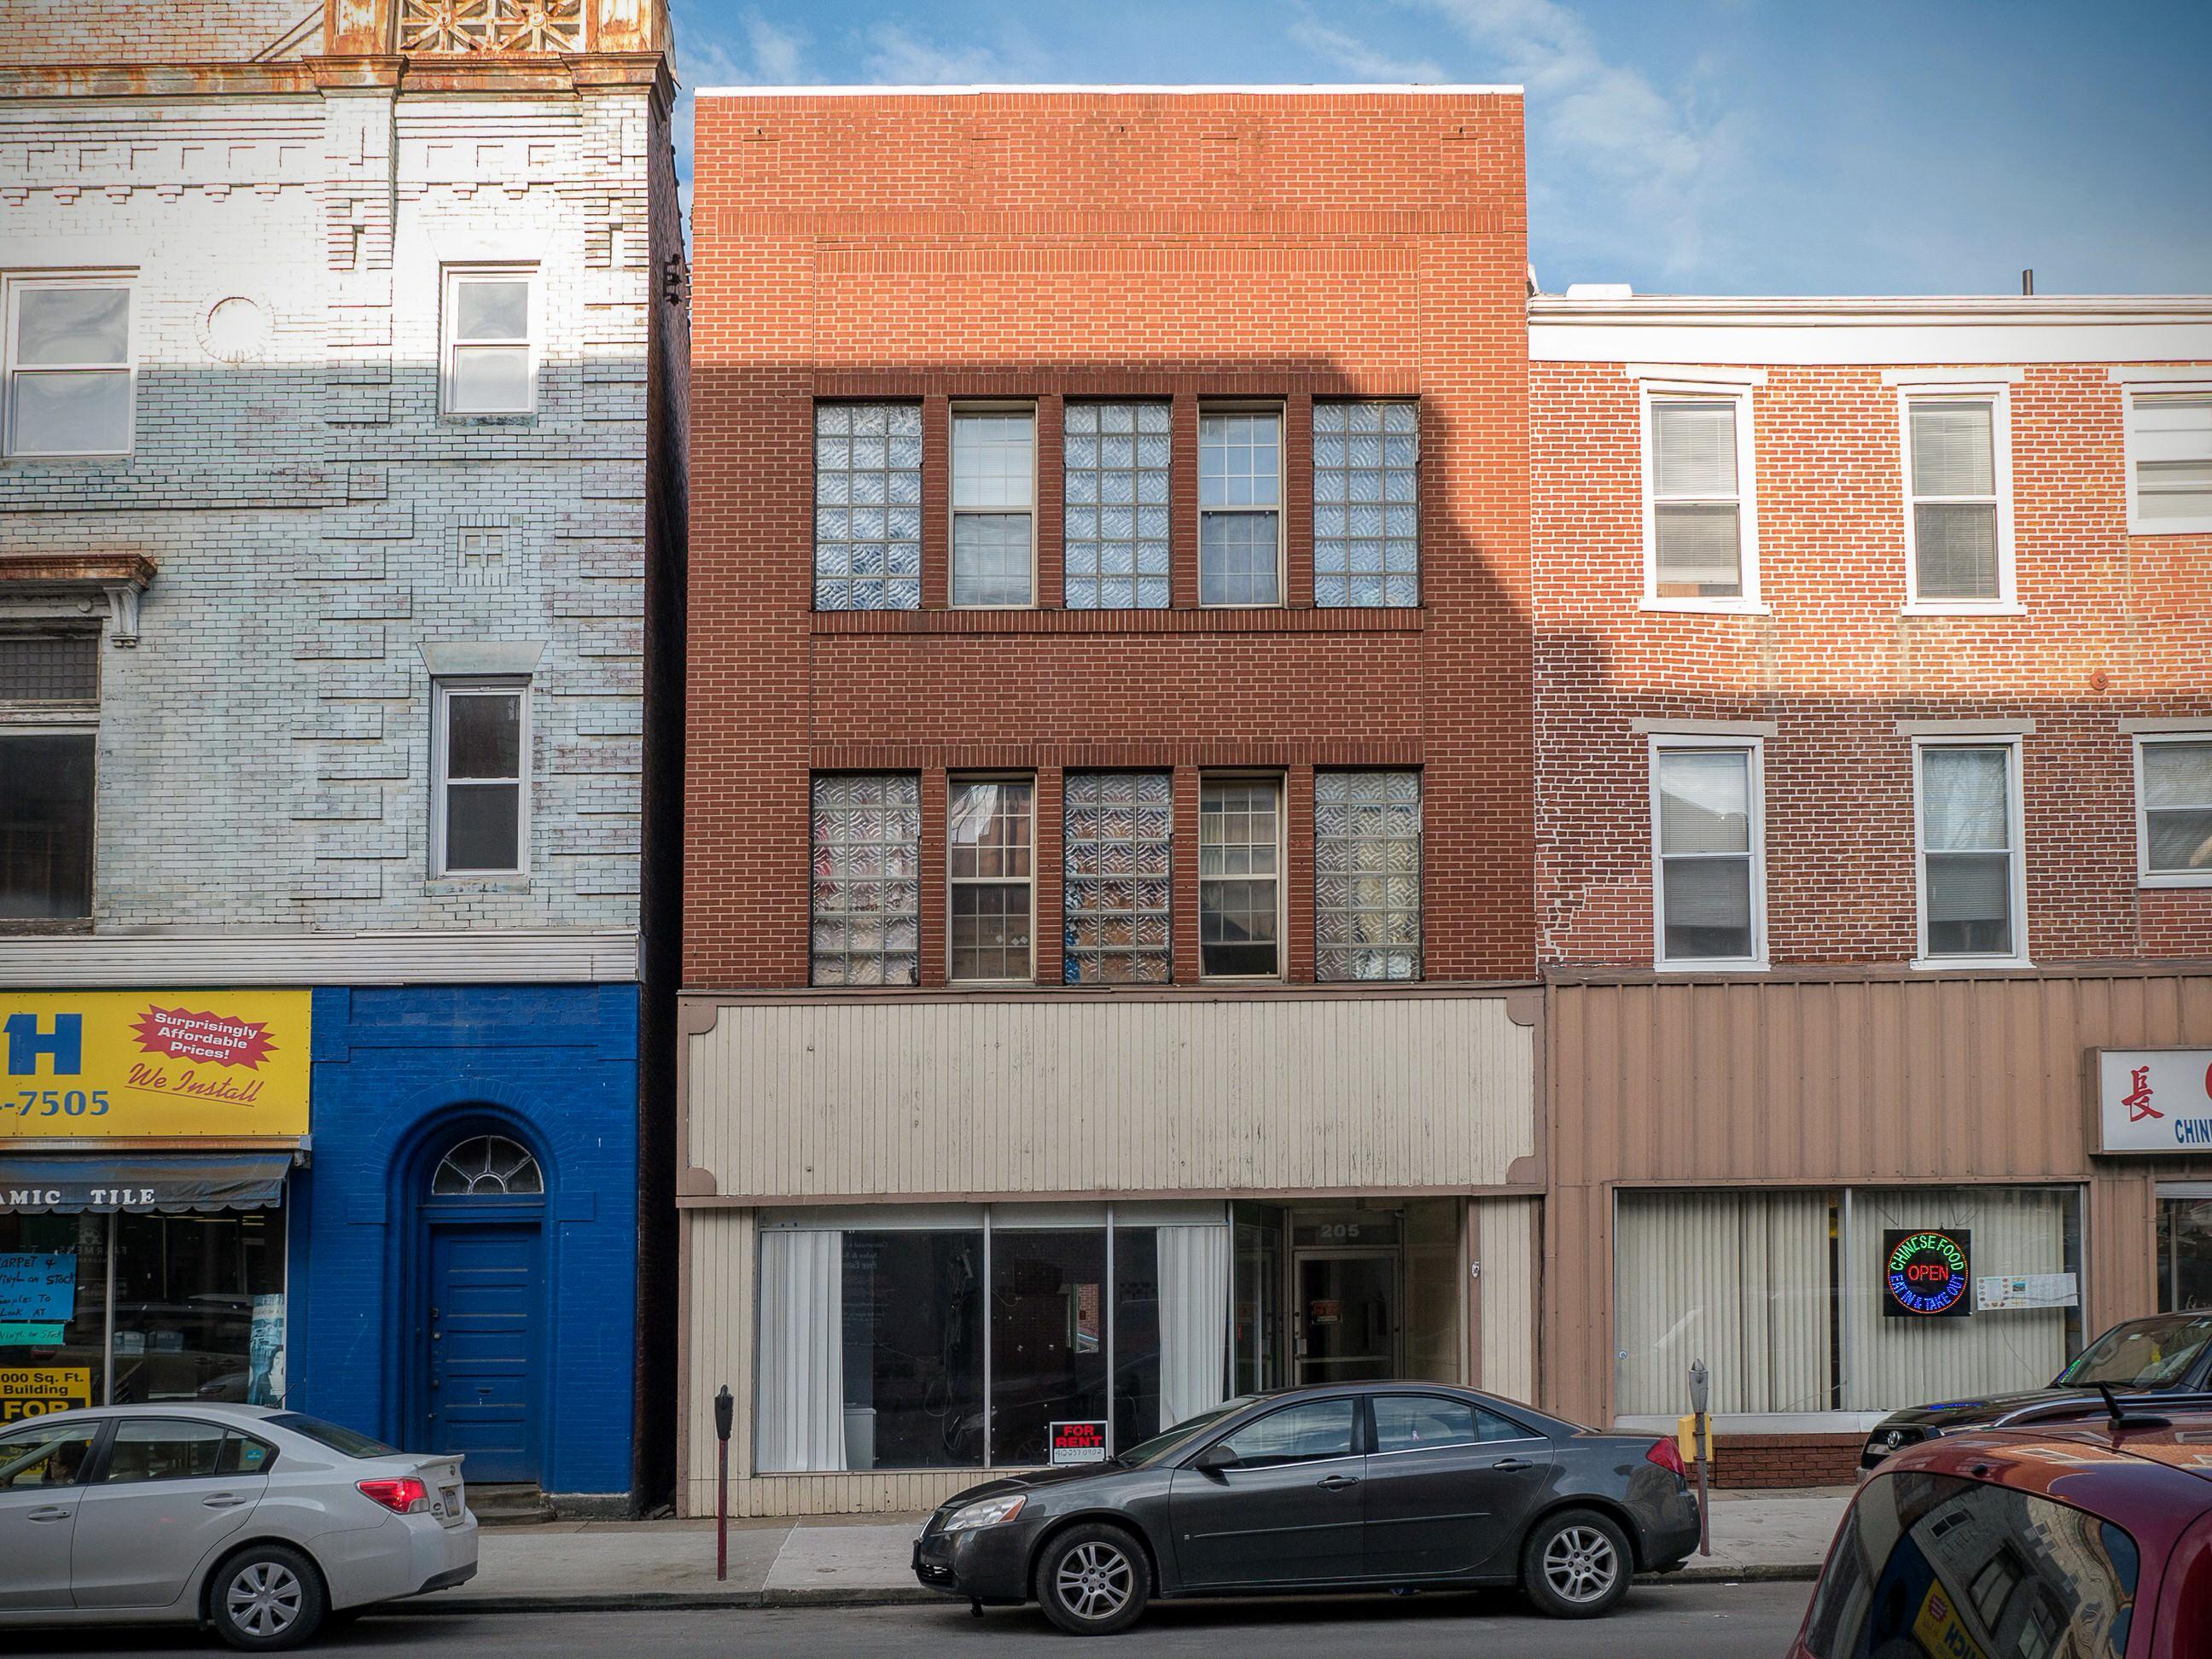 Photo of building at 205 West Main Street, Monongahela, Pa. 15063 along rt 88 and rt 136. Photo property of the Monongahela Main Street Program.